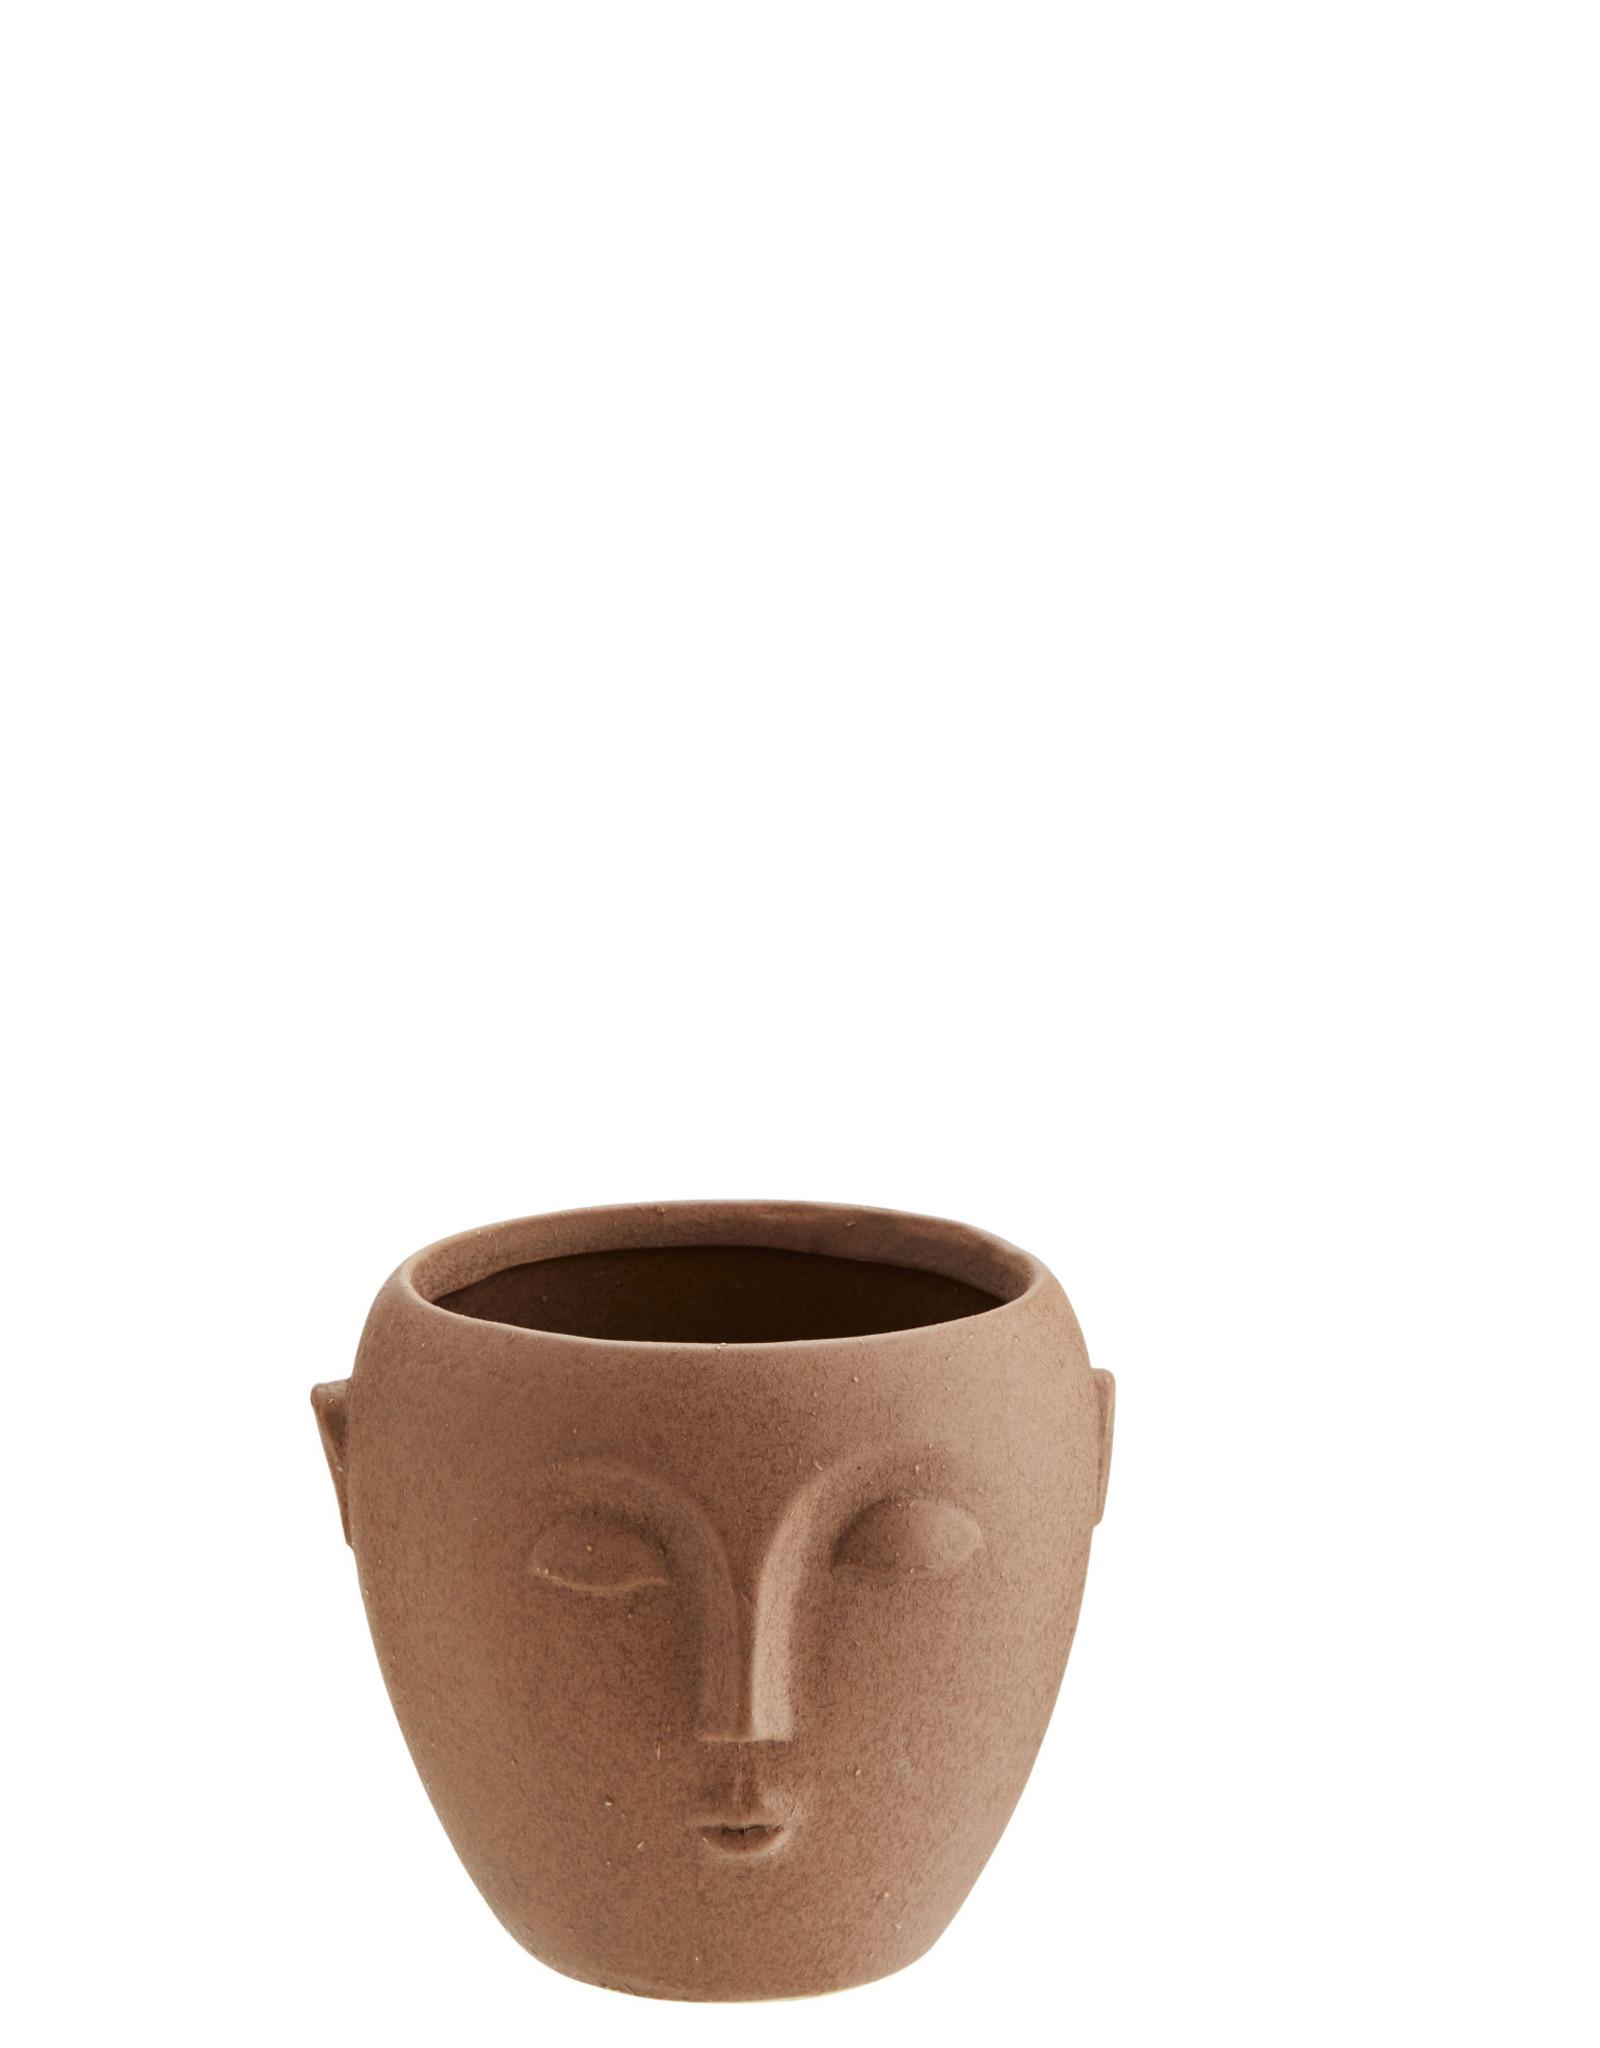 Madam Stoltz Flower pot w/ face - Red/Brown ∅8,5